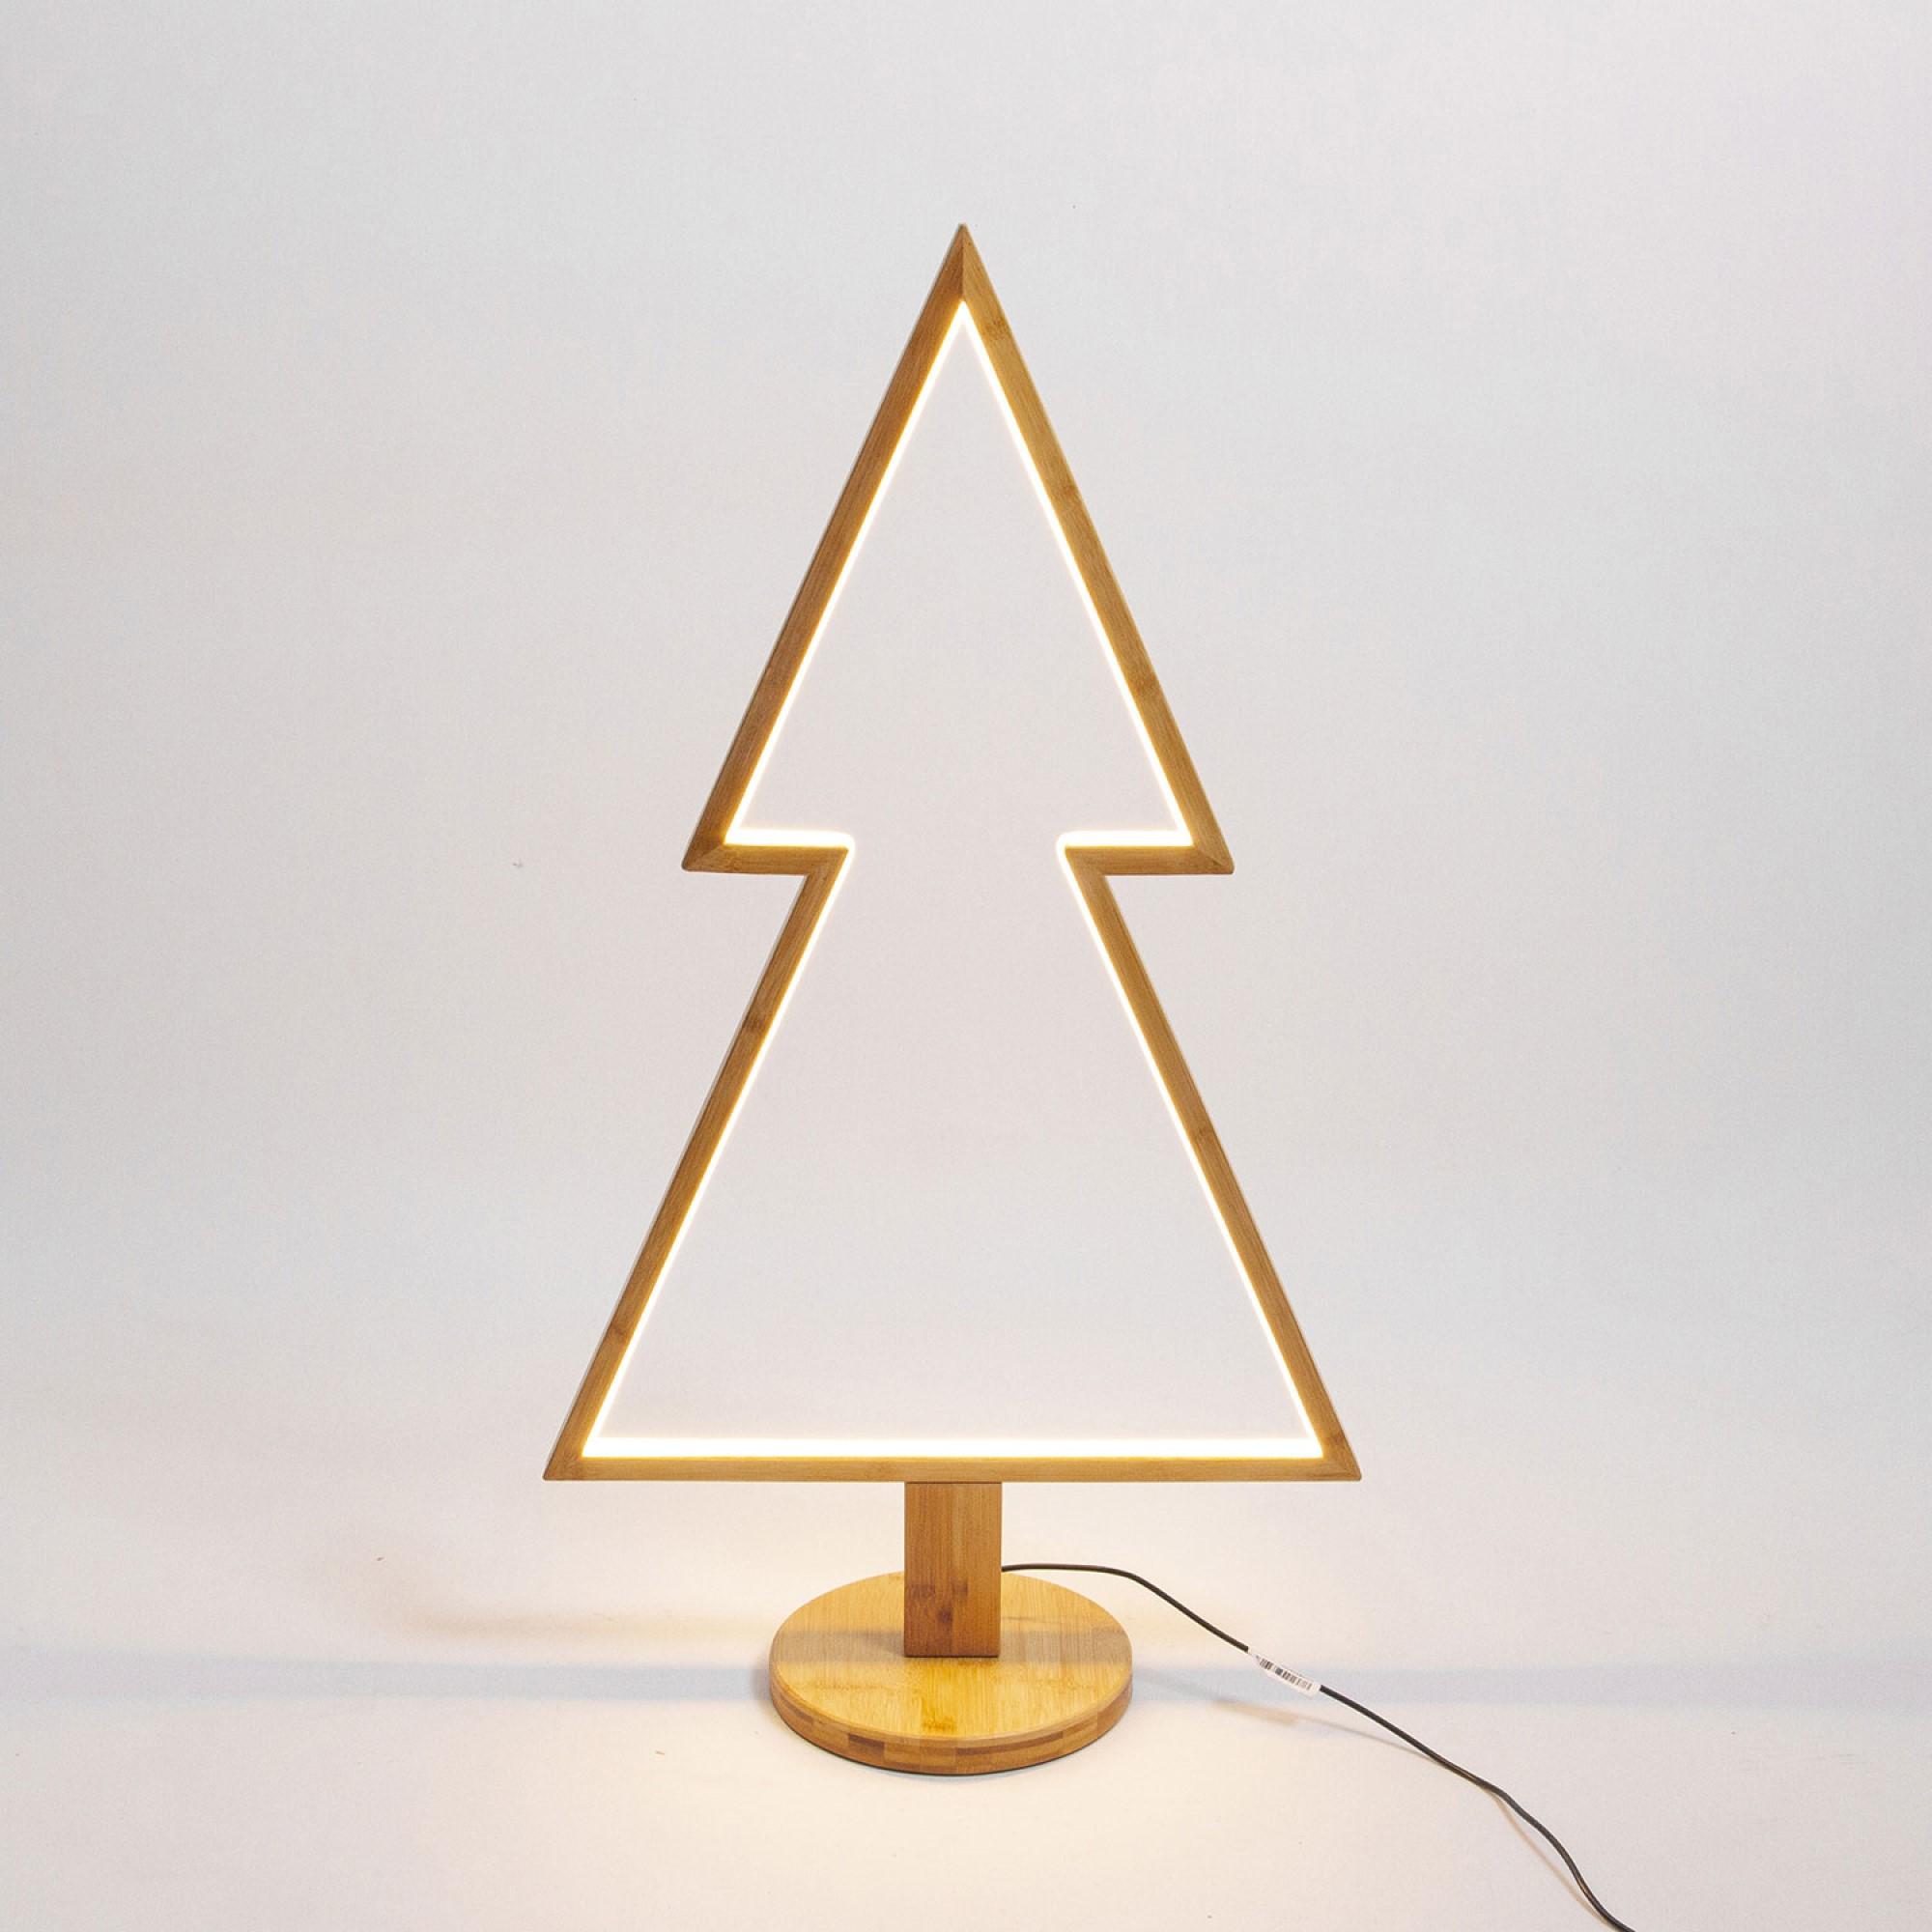 Lotti LED-Weihnachtsbaum, Holz, 3000K, 90cm, IP20 58682